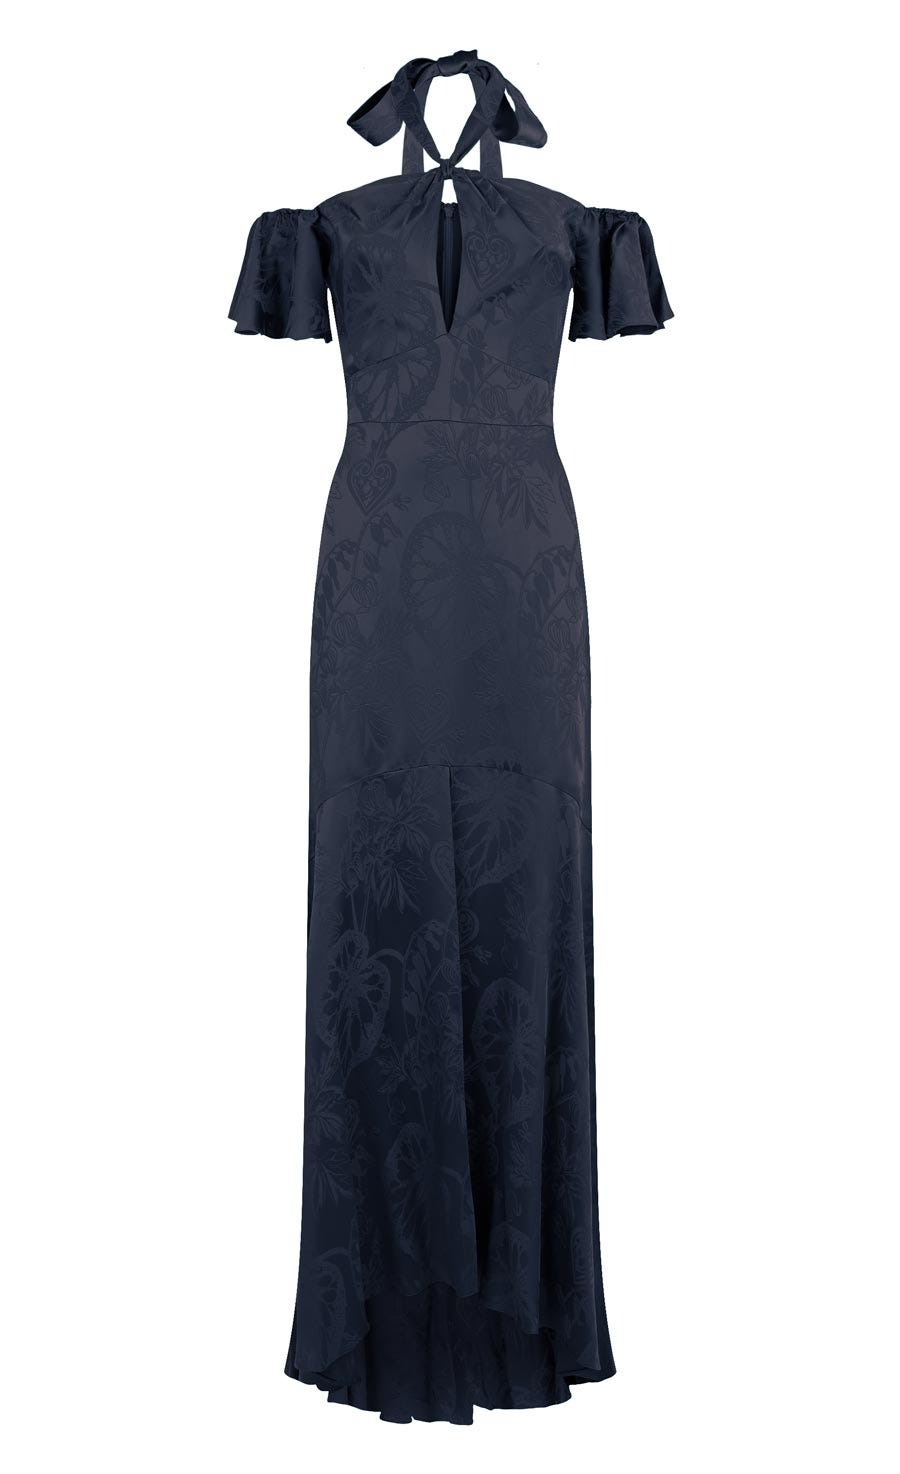 Orbit Dress, Midnight